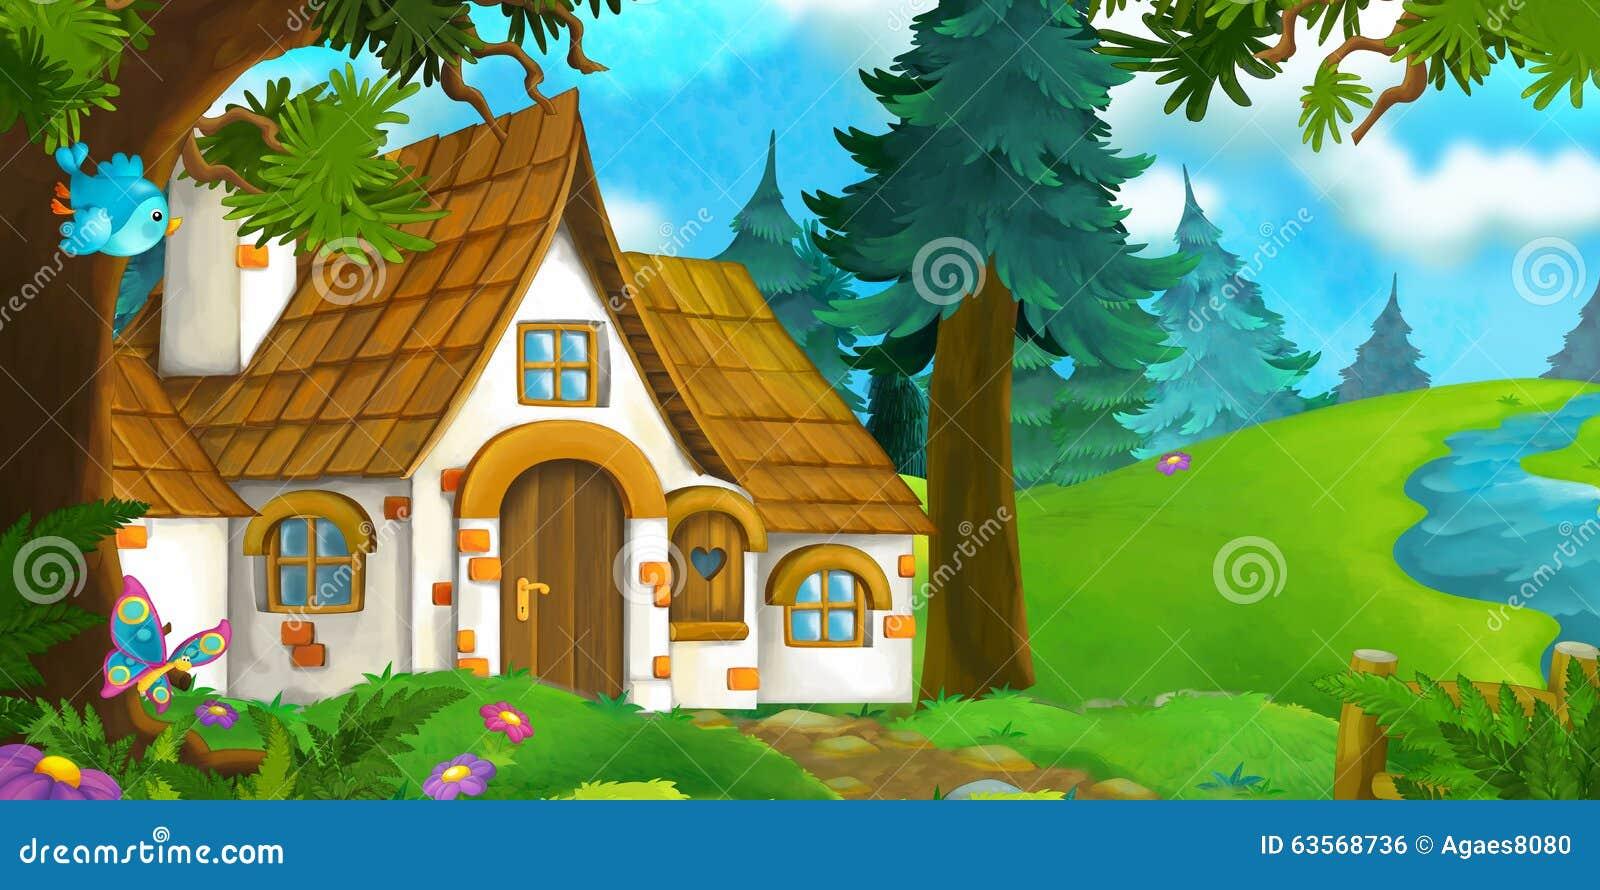 House Cartoon Background Www Pixshark Com Images